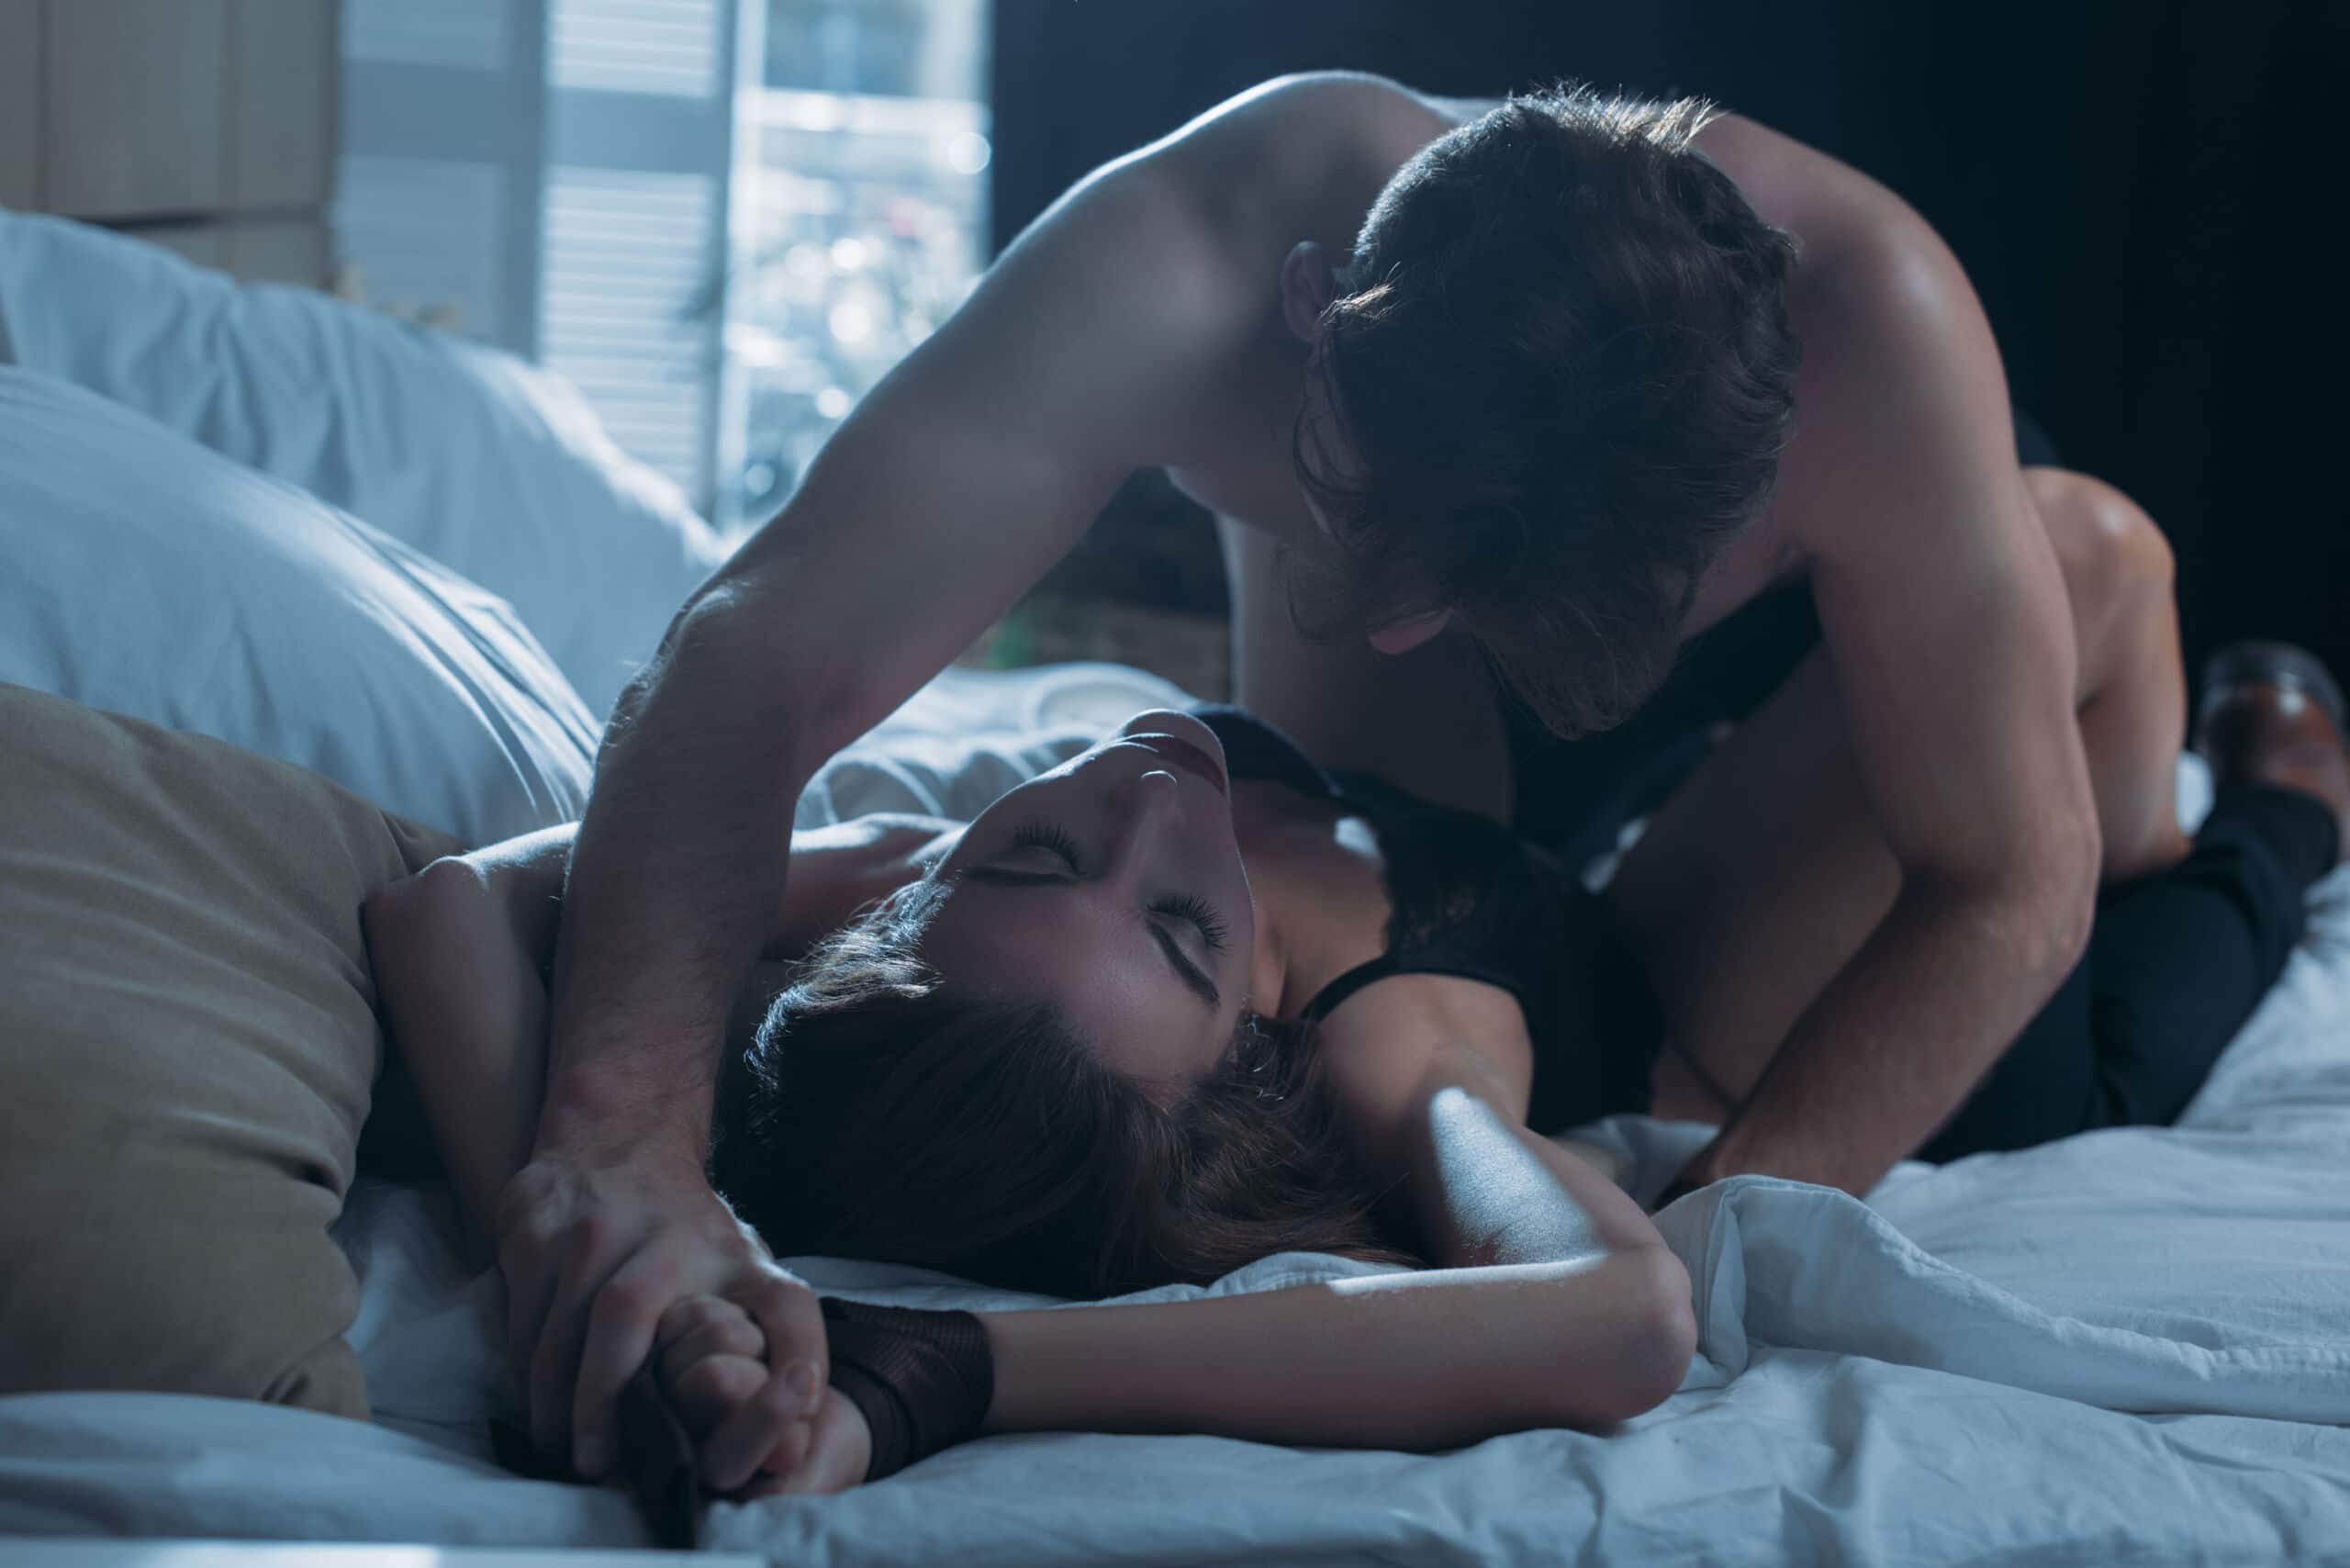 How to Make sex more fun